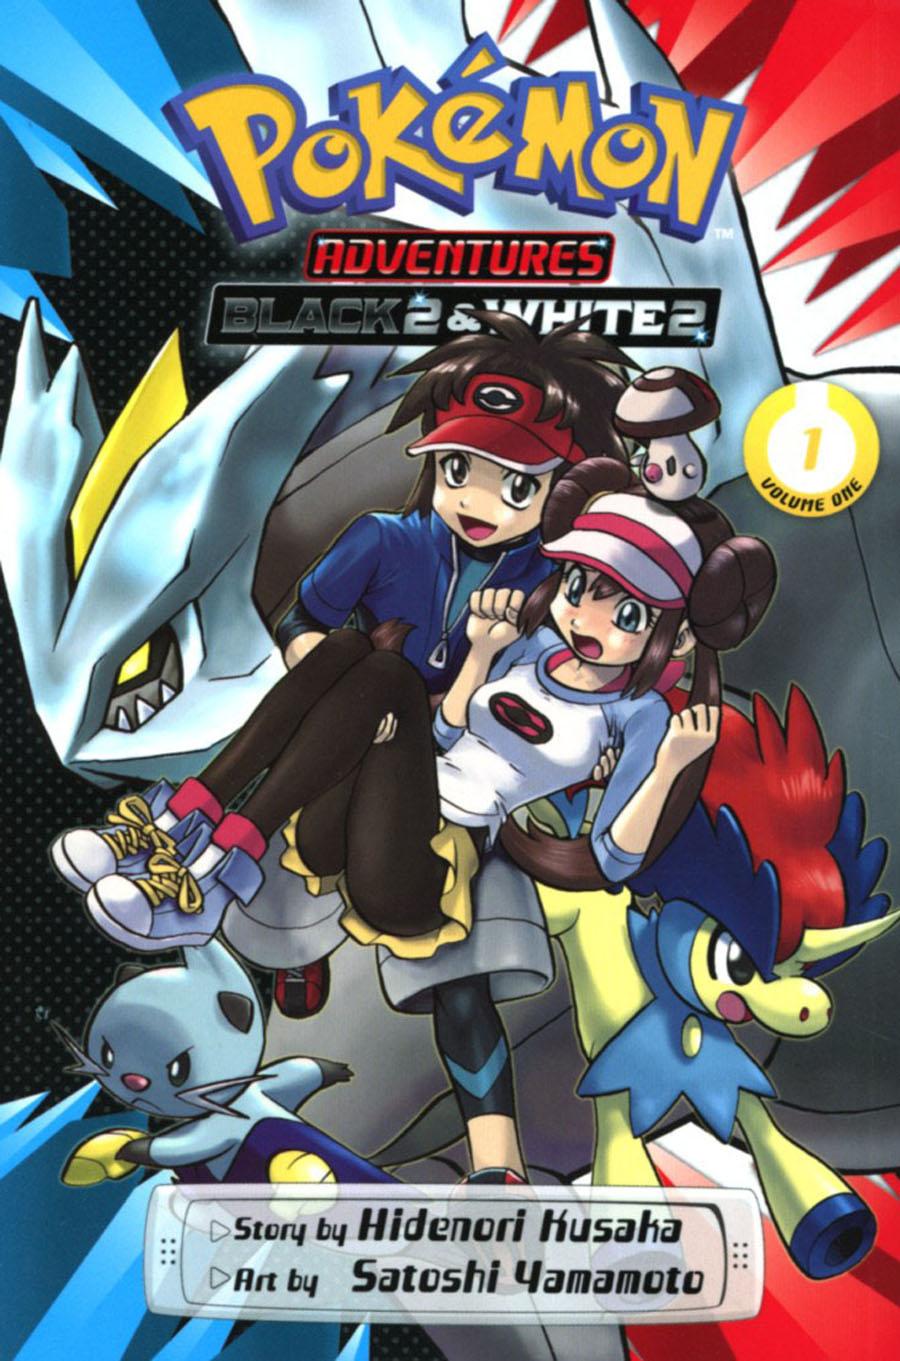 Pokemon Adventures Black 2 & White 2 Vol 1 GN